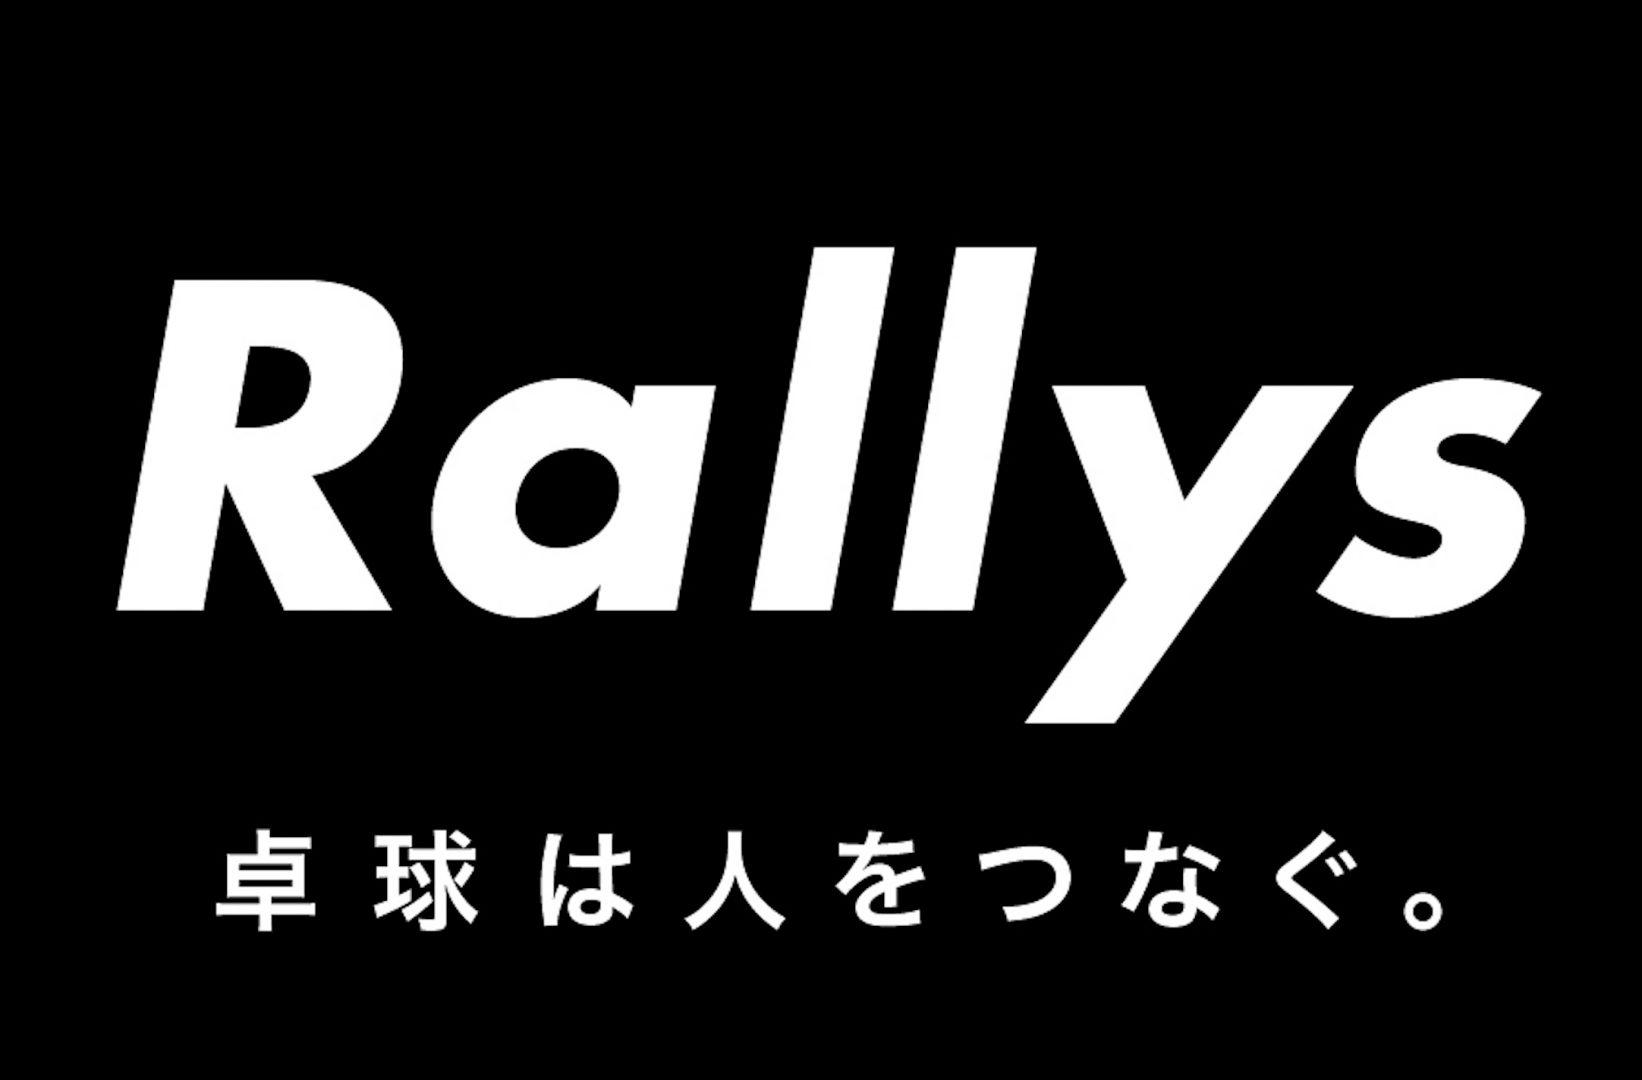 【Rallys Career主催・5名限定】卓球部出身者のためのキャリア相談会 緊急開催決定!